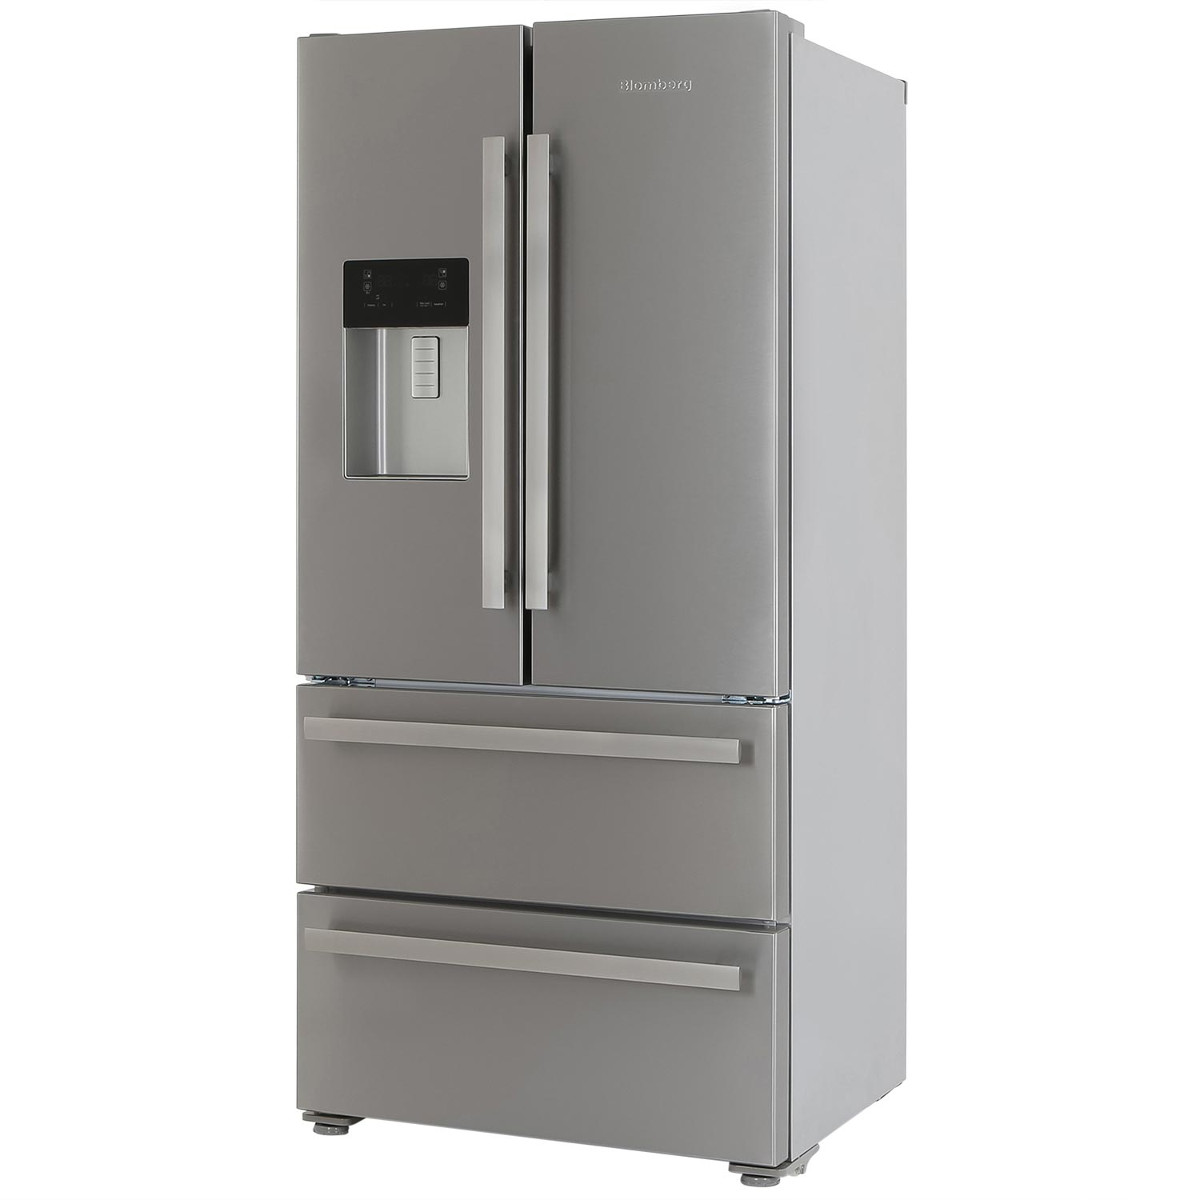 Blomberg Kfd4952xd American Style Four Door Fridge Freezer